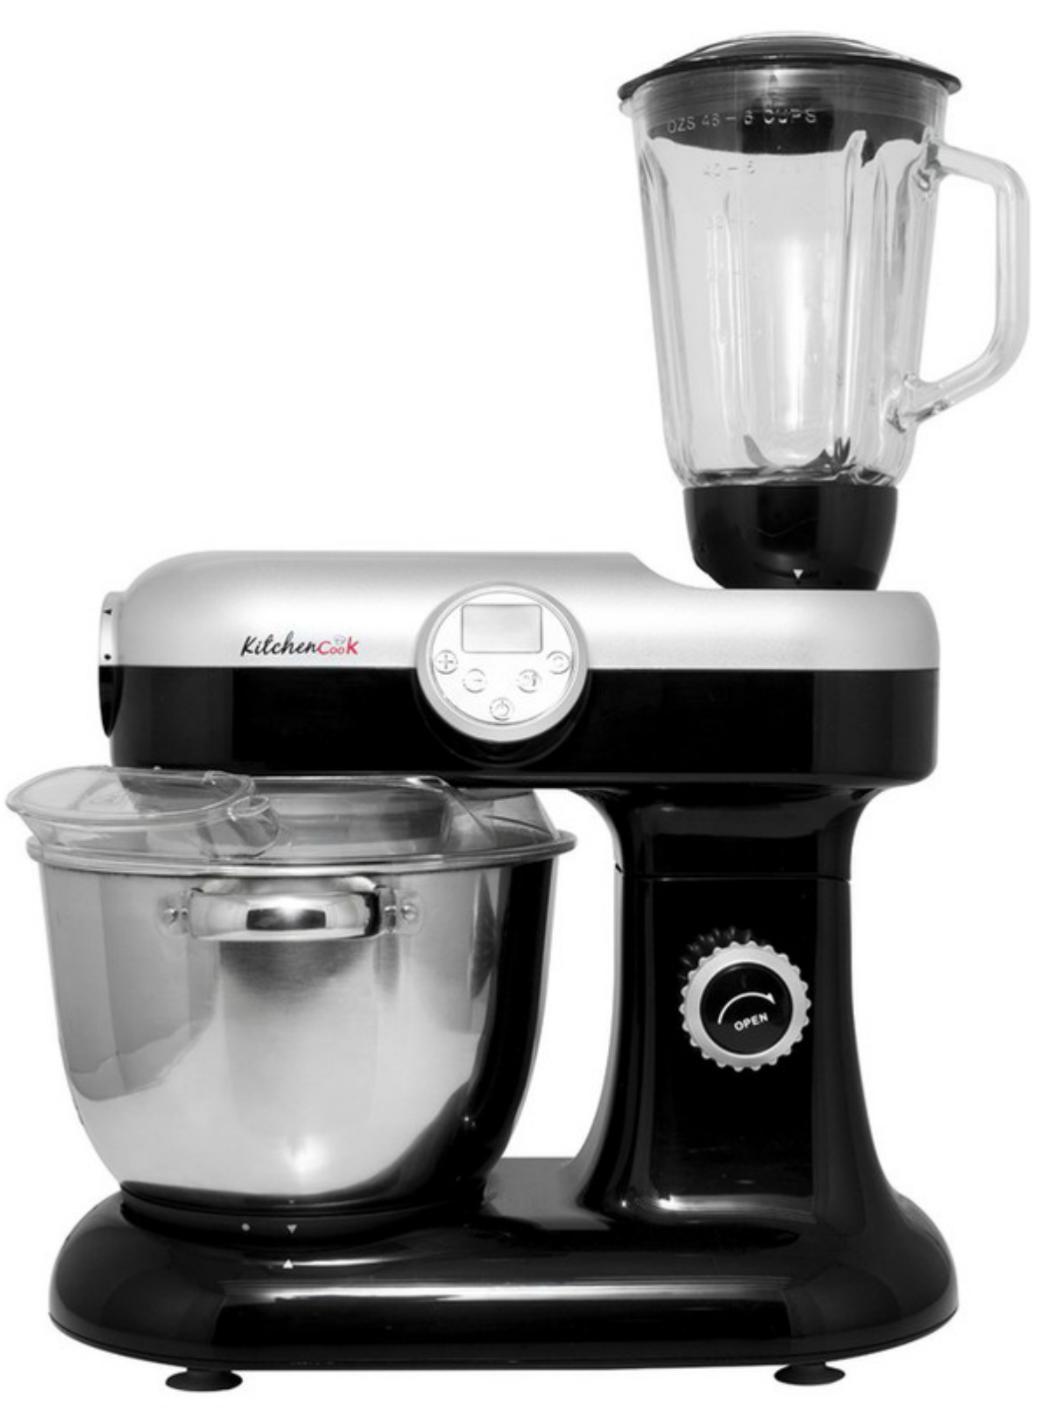 Robot Cuiseur Kitchen Cook revolution V3 Noir